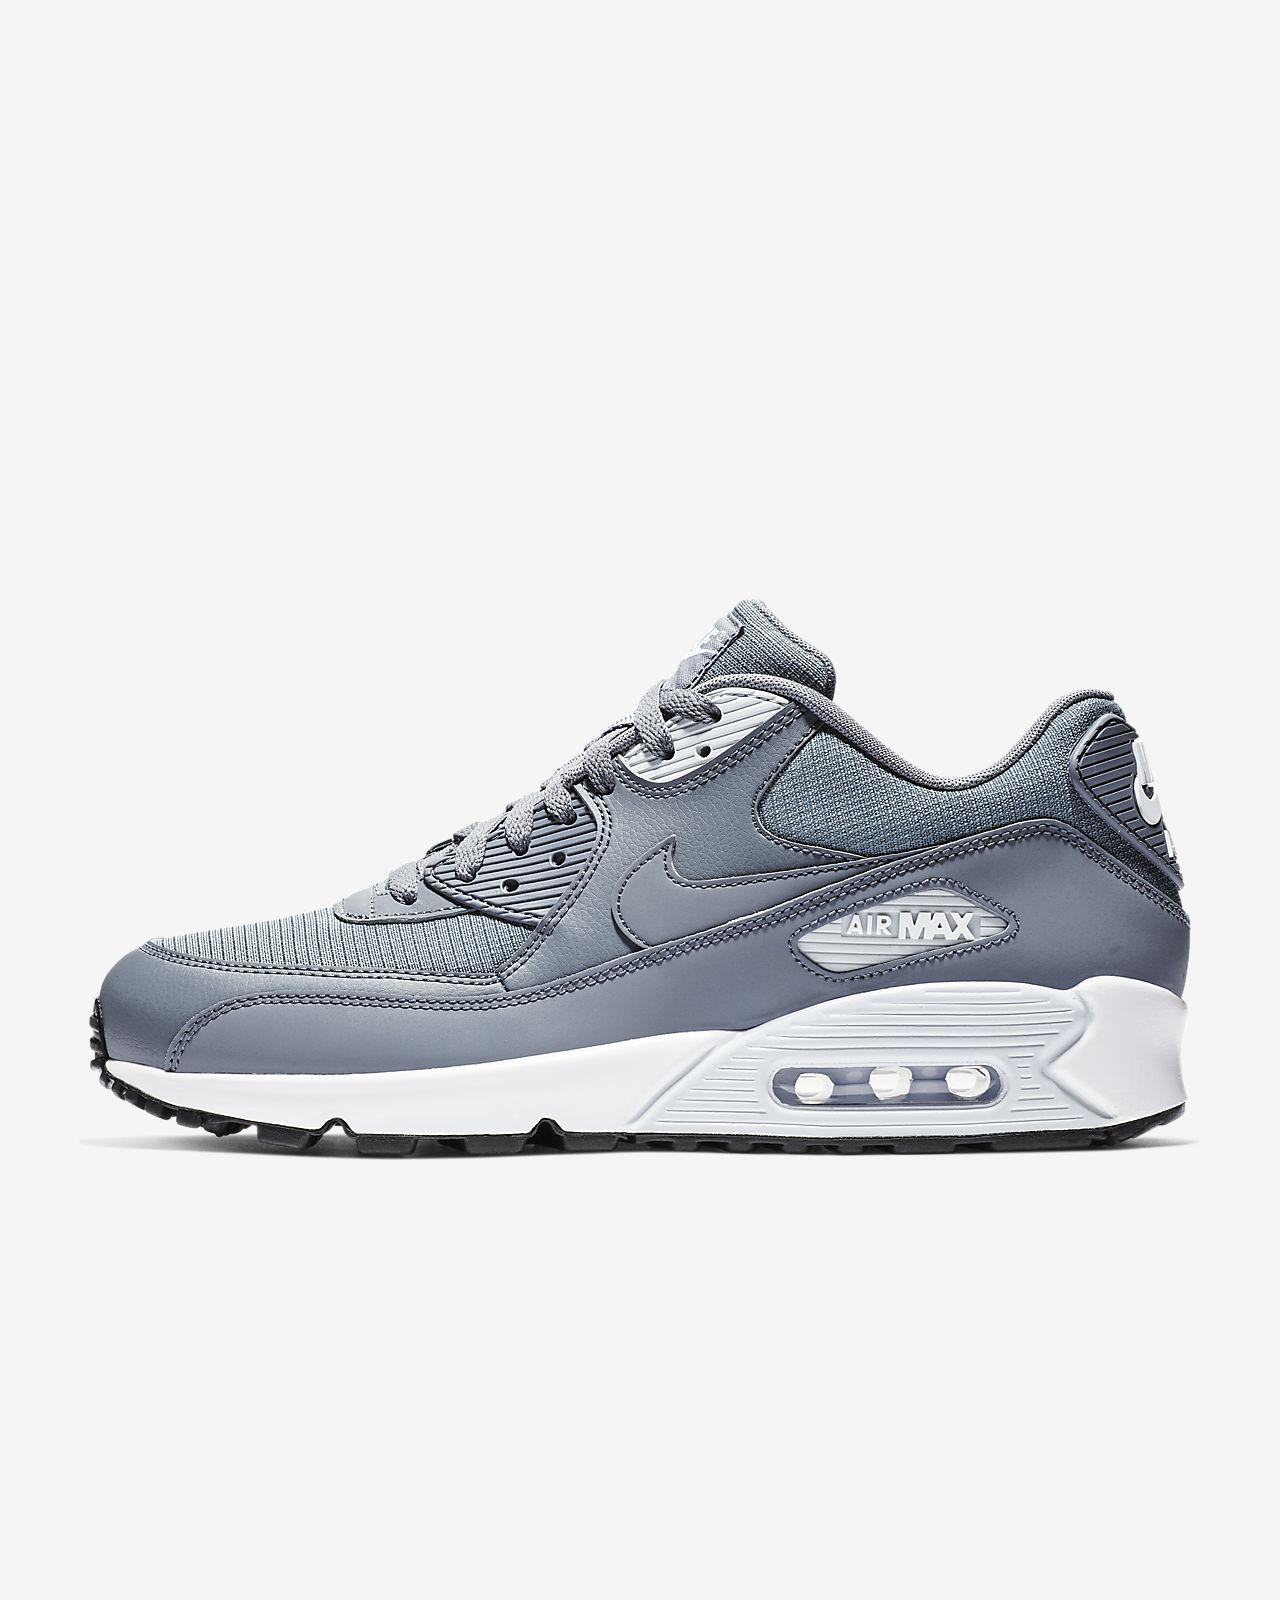 in stock da32d d3c4e ... Nike Air Max 90 SE Men s Shoe